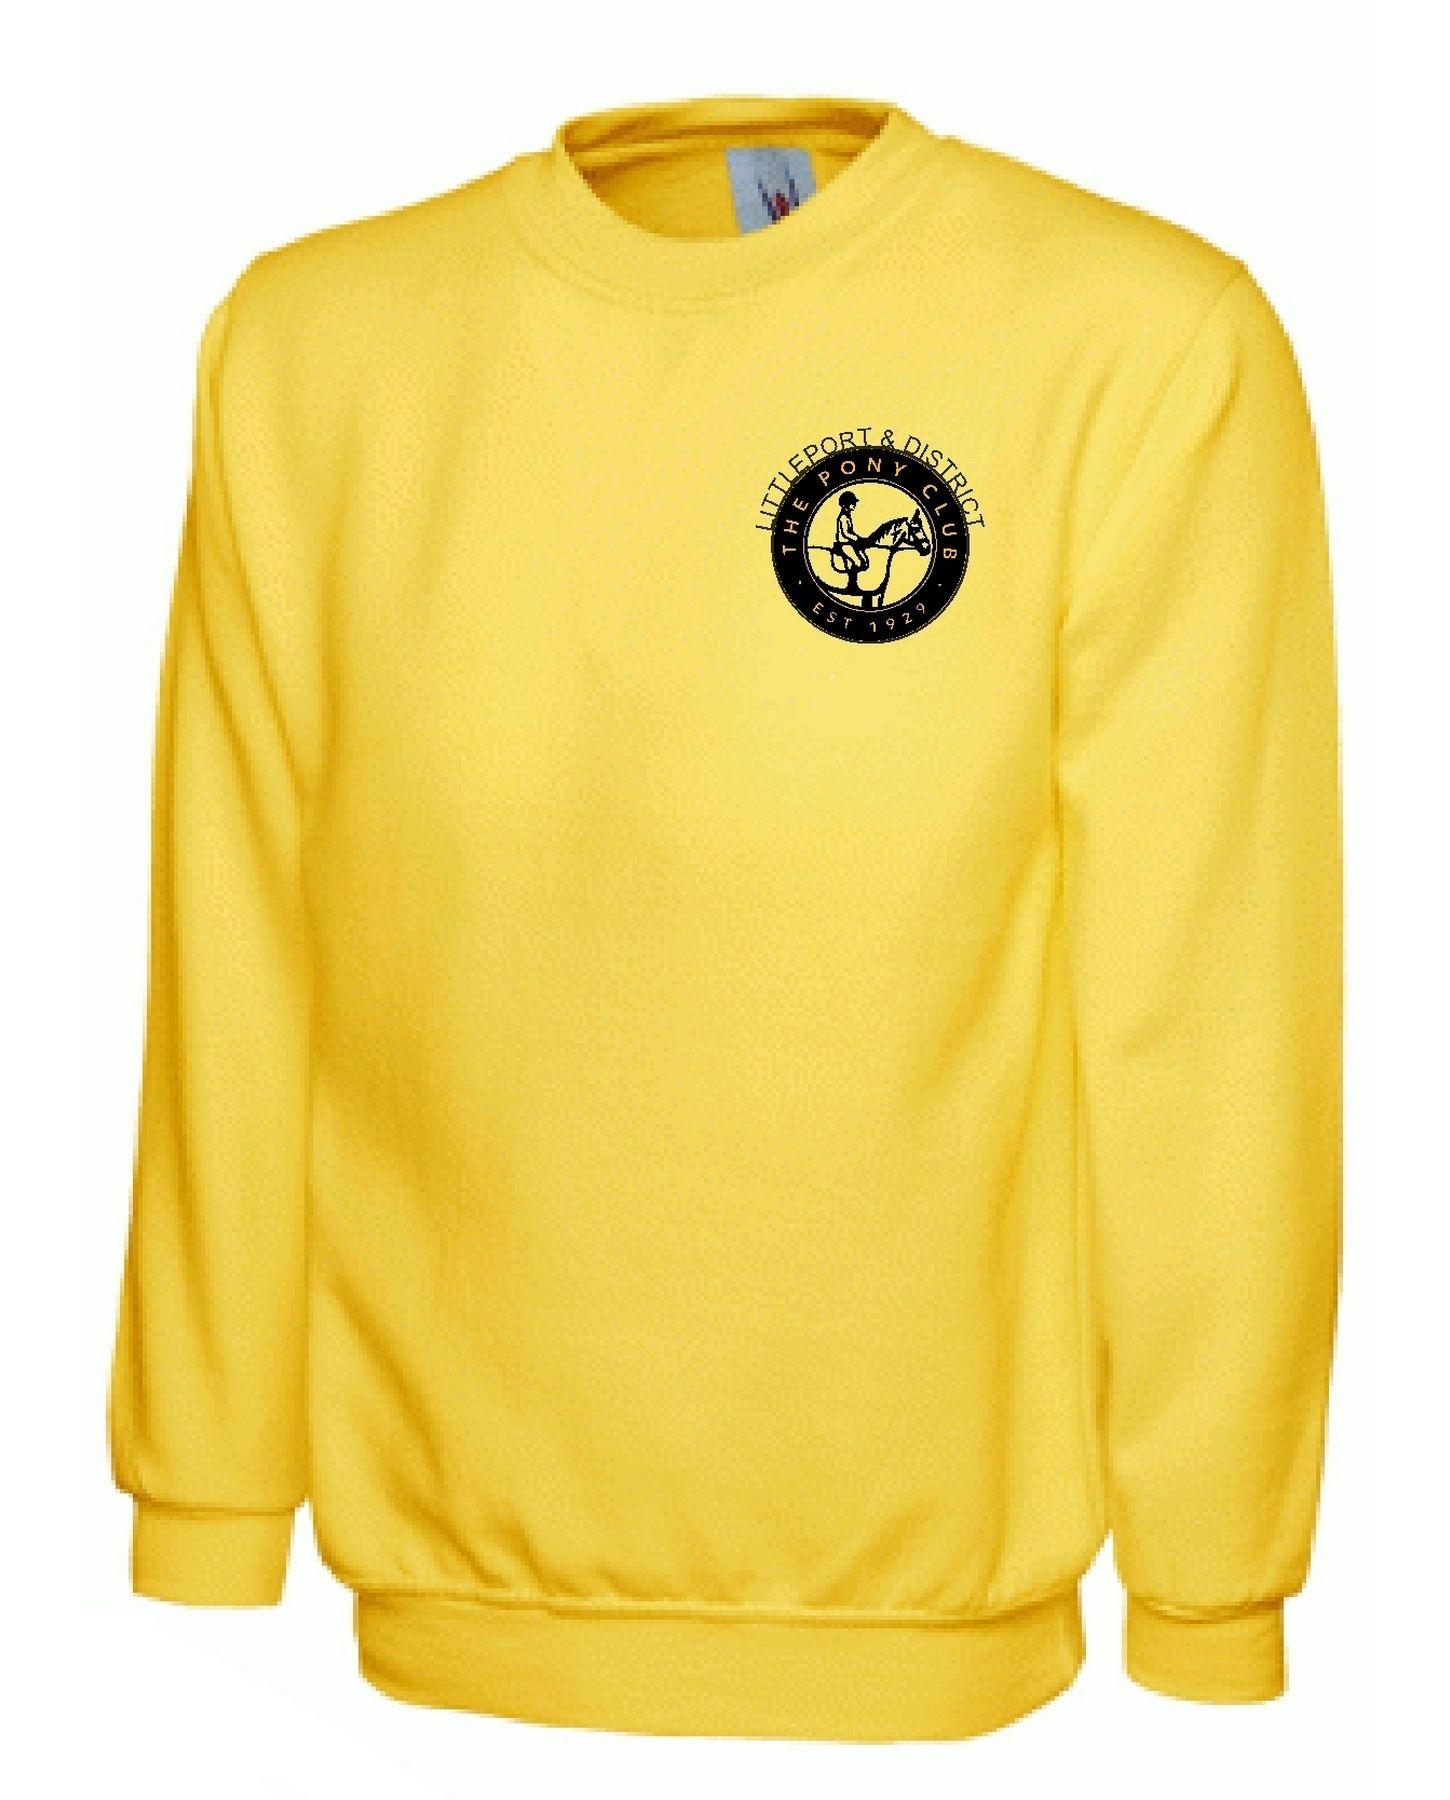 Littleport & District Pony Club – Sweatshirt Adults